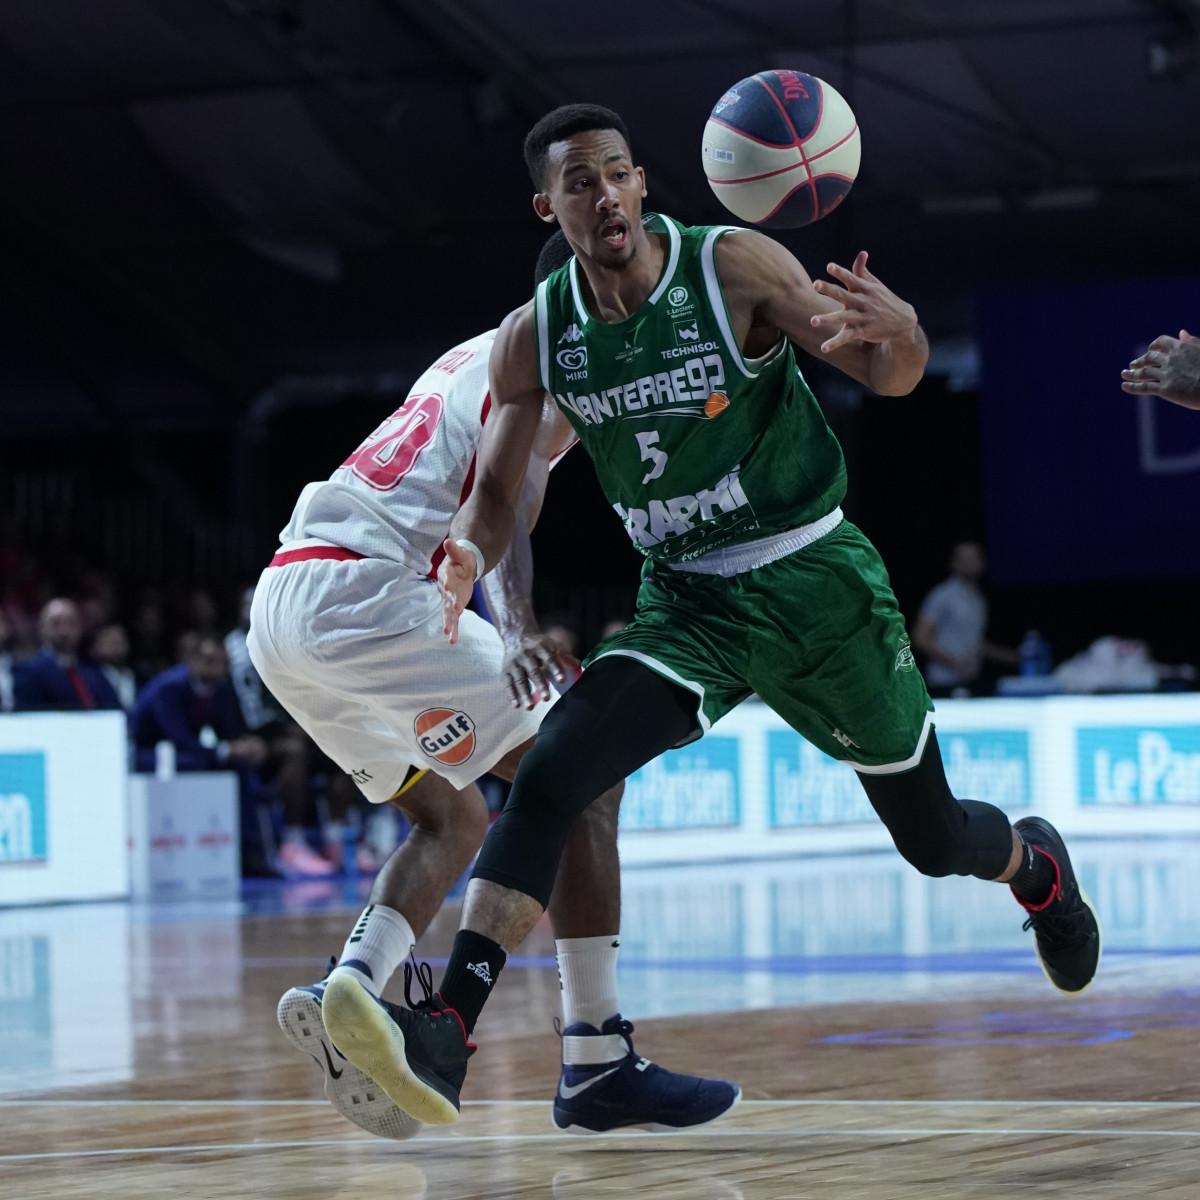 Photo of Mehdy Ngouama, 2019-2020 season